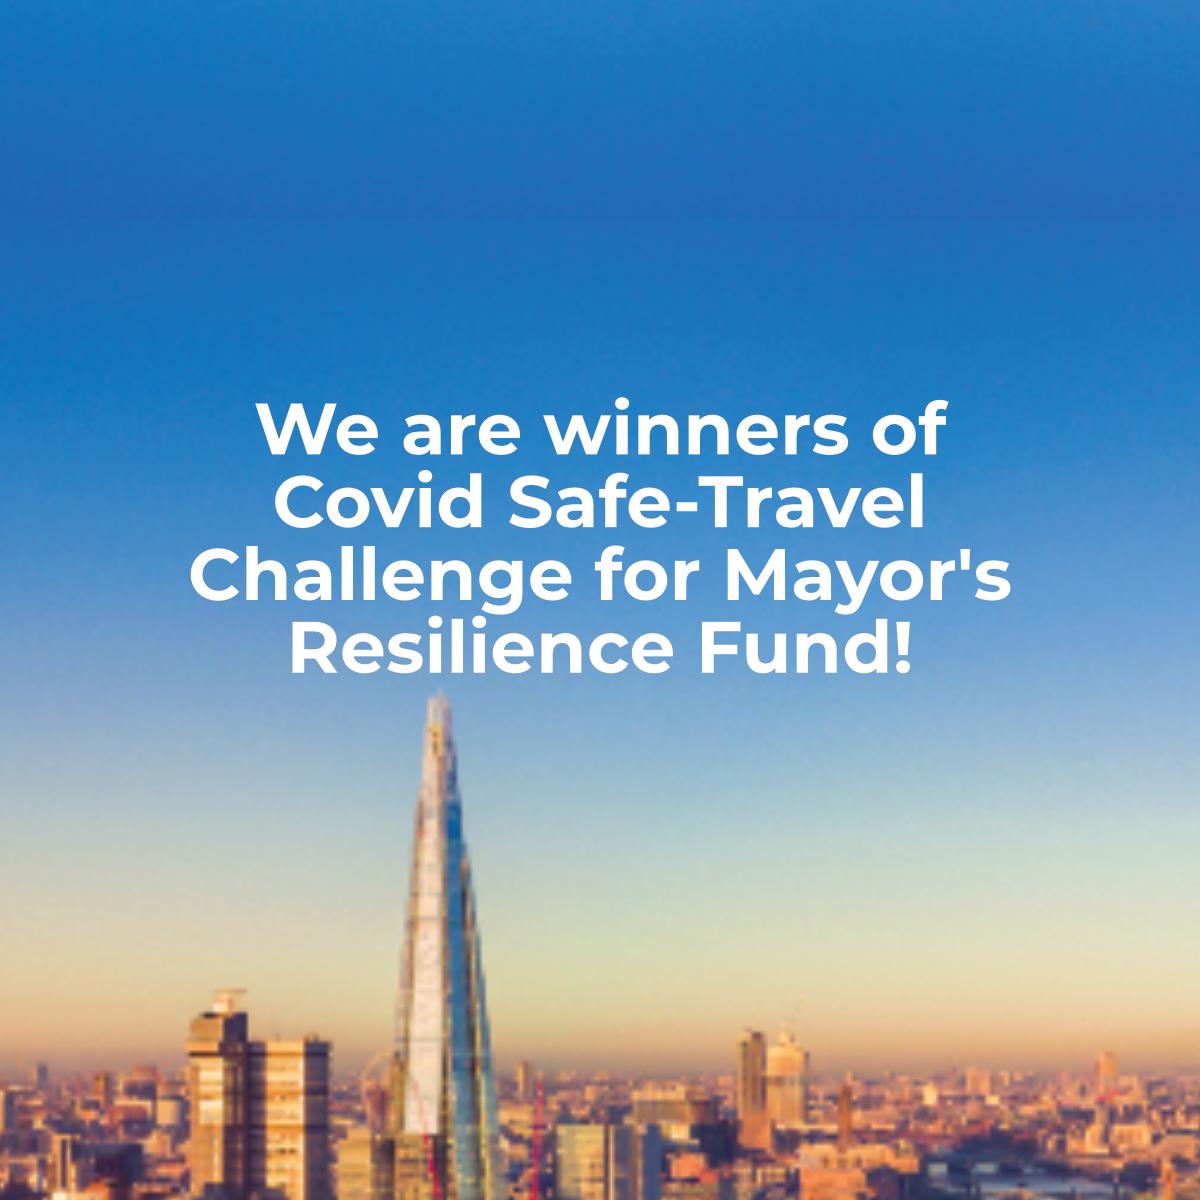 JNCTION Mayor of London